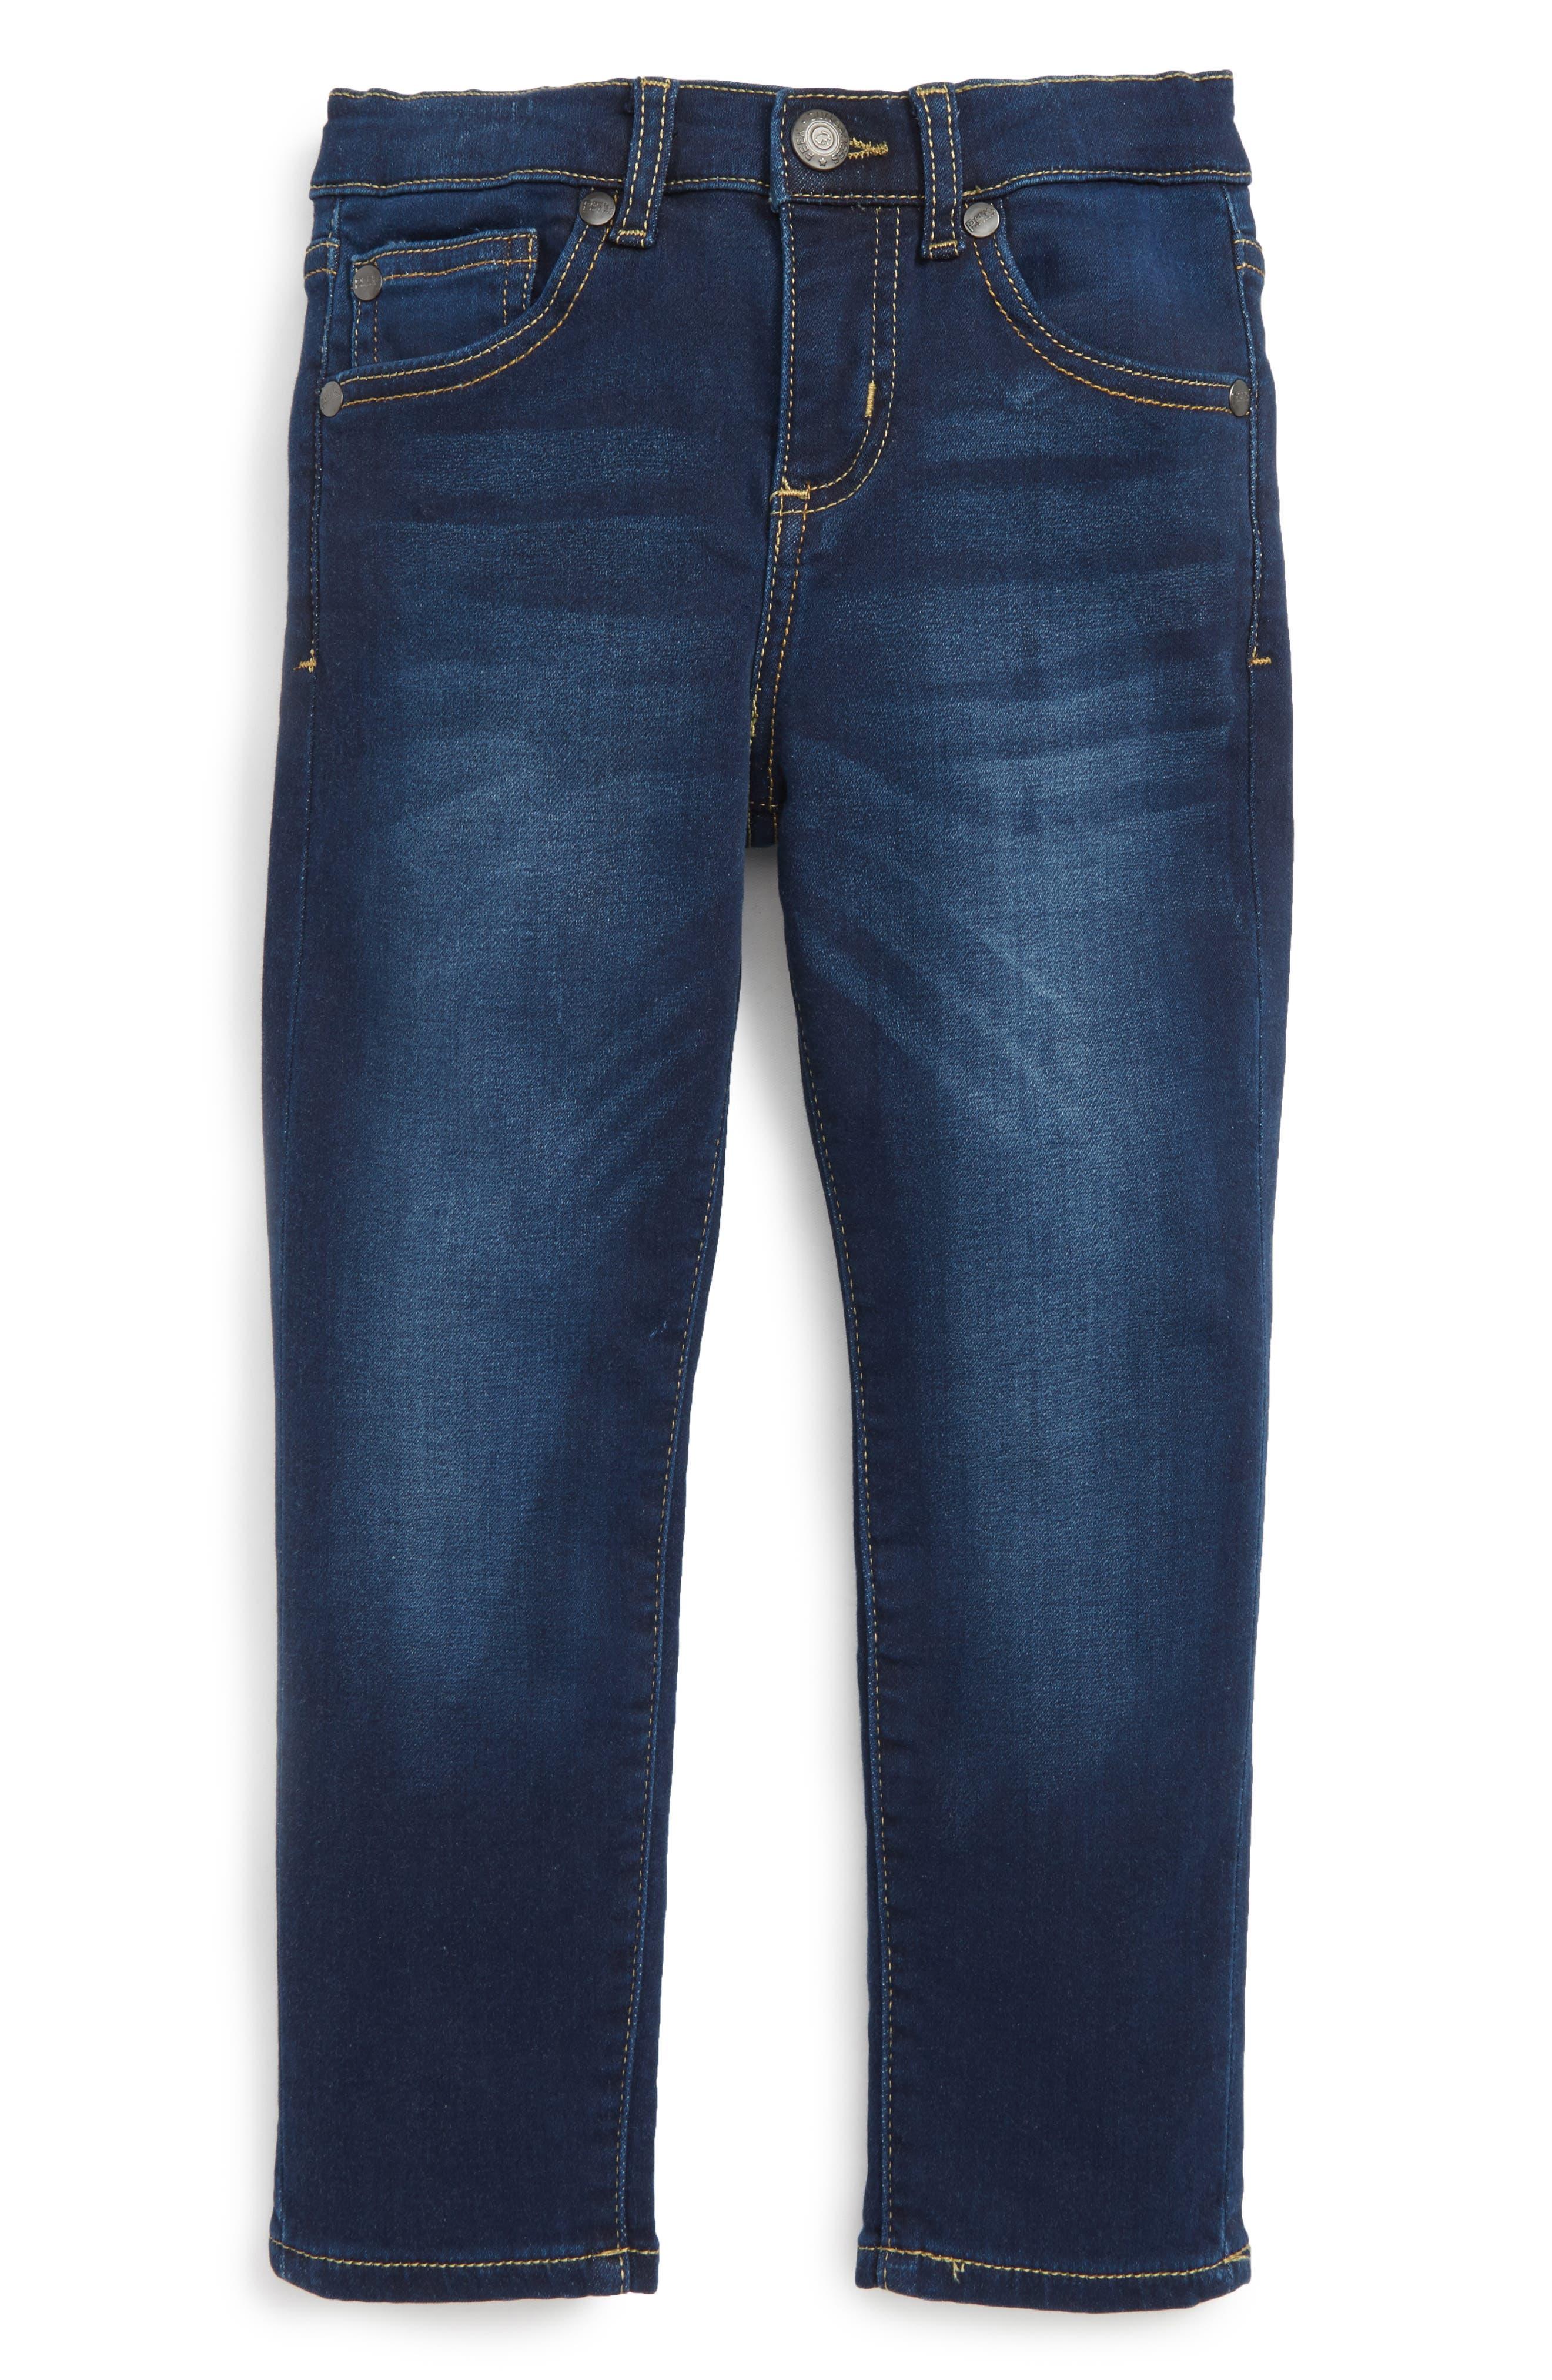 Peek Stretch Cotton Skinny Jeans (Toddler Boys, Little Boys & Big Boys)